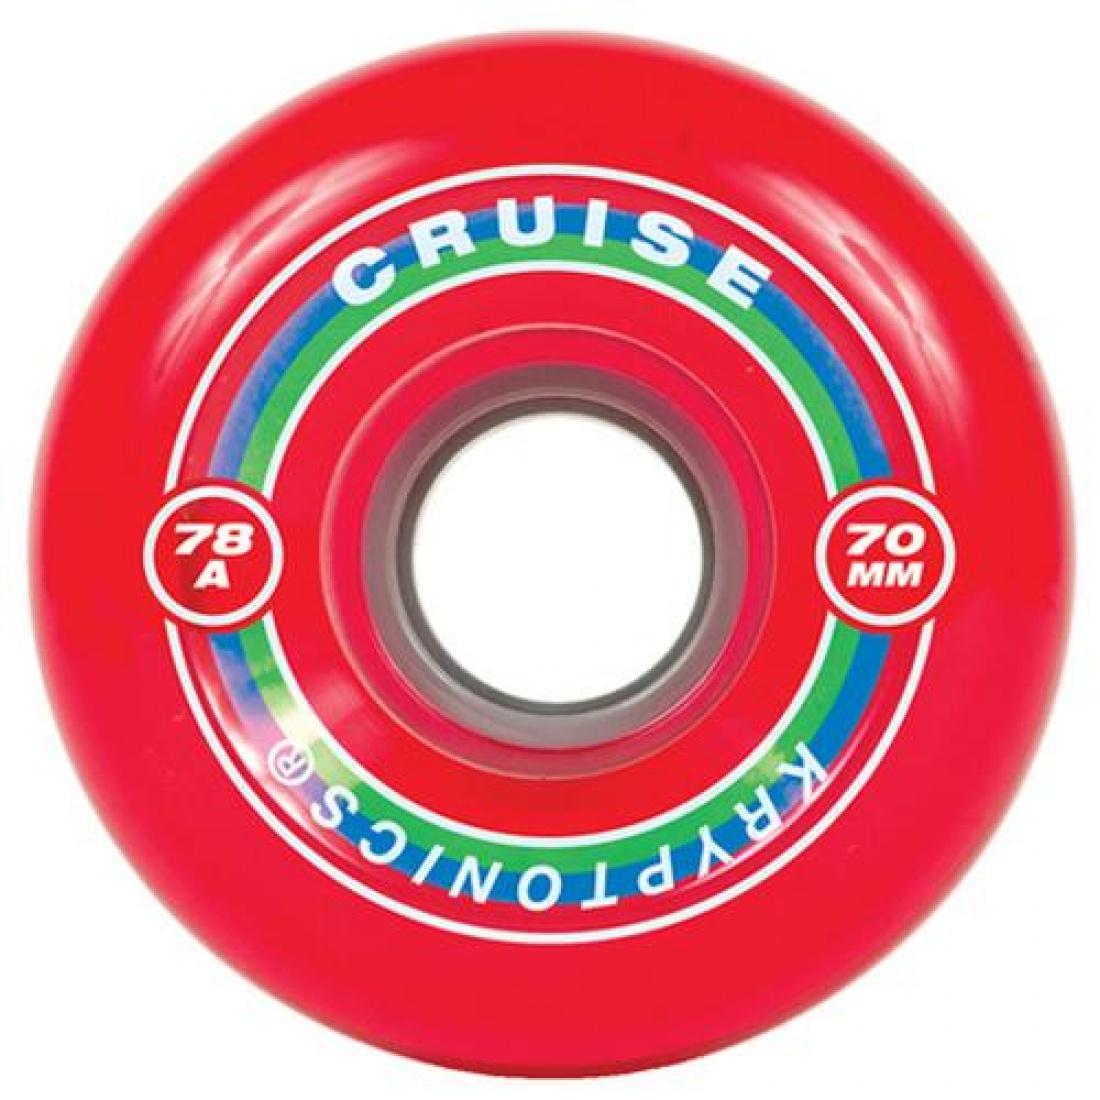 KRY-Cruise Wheels Red 70mm